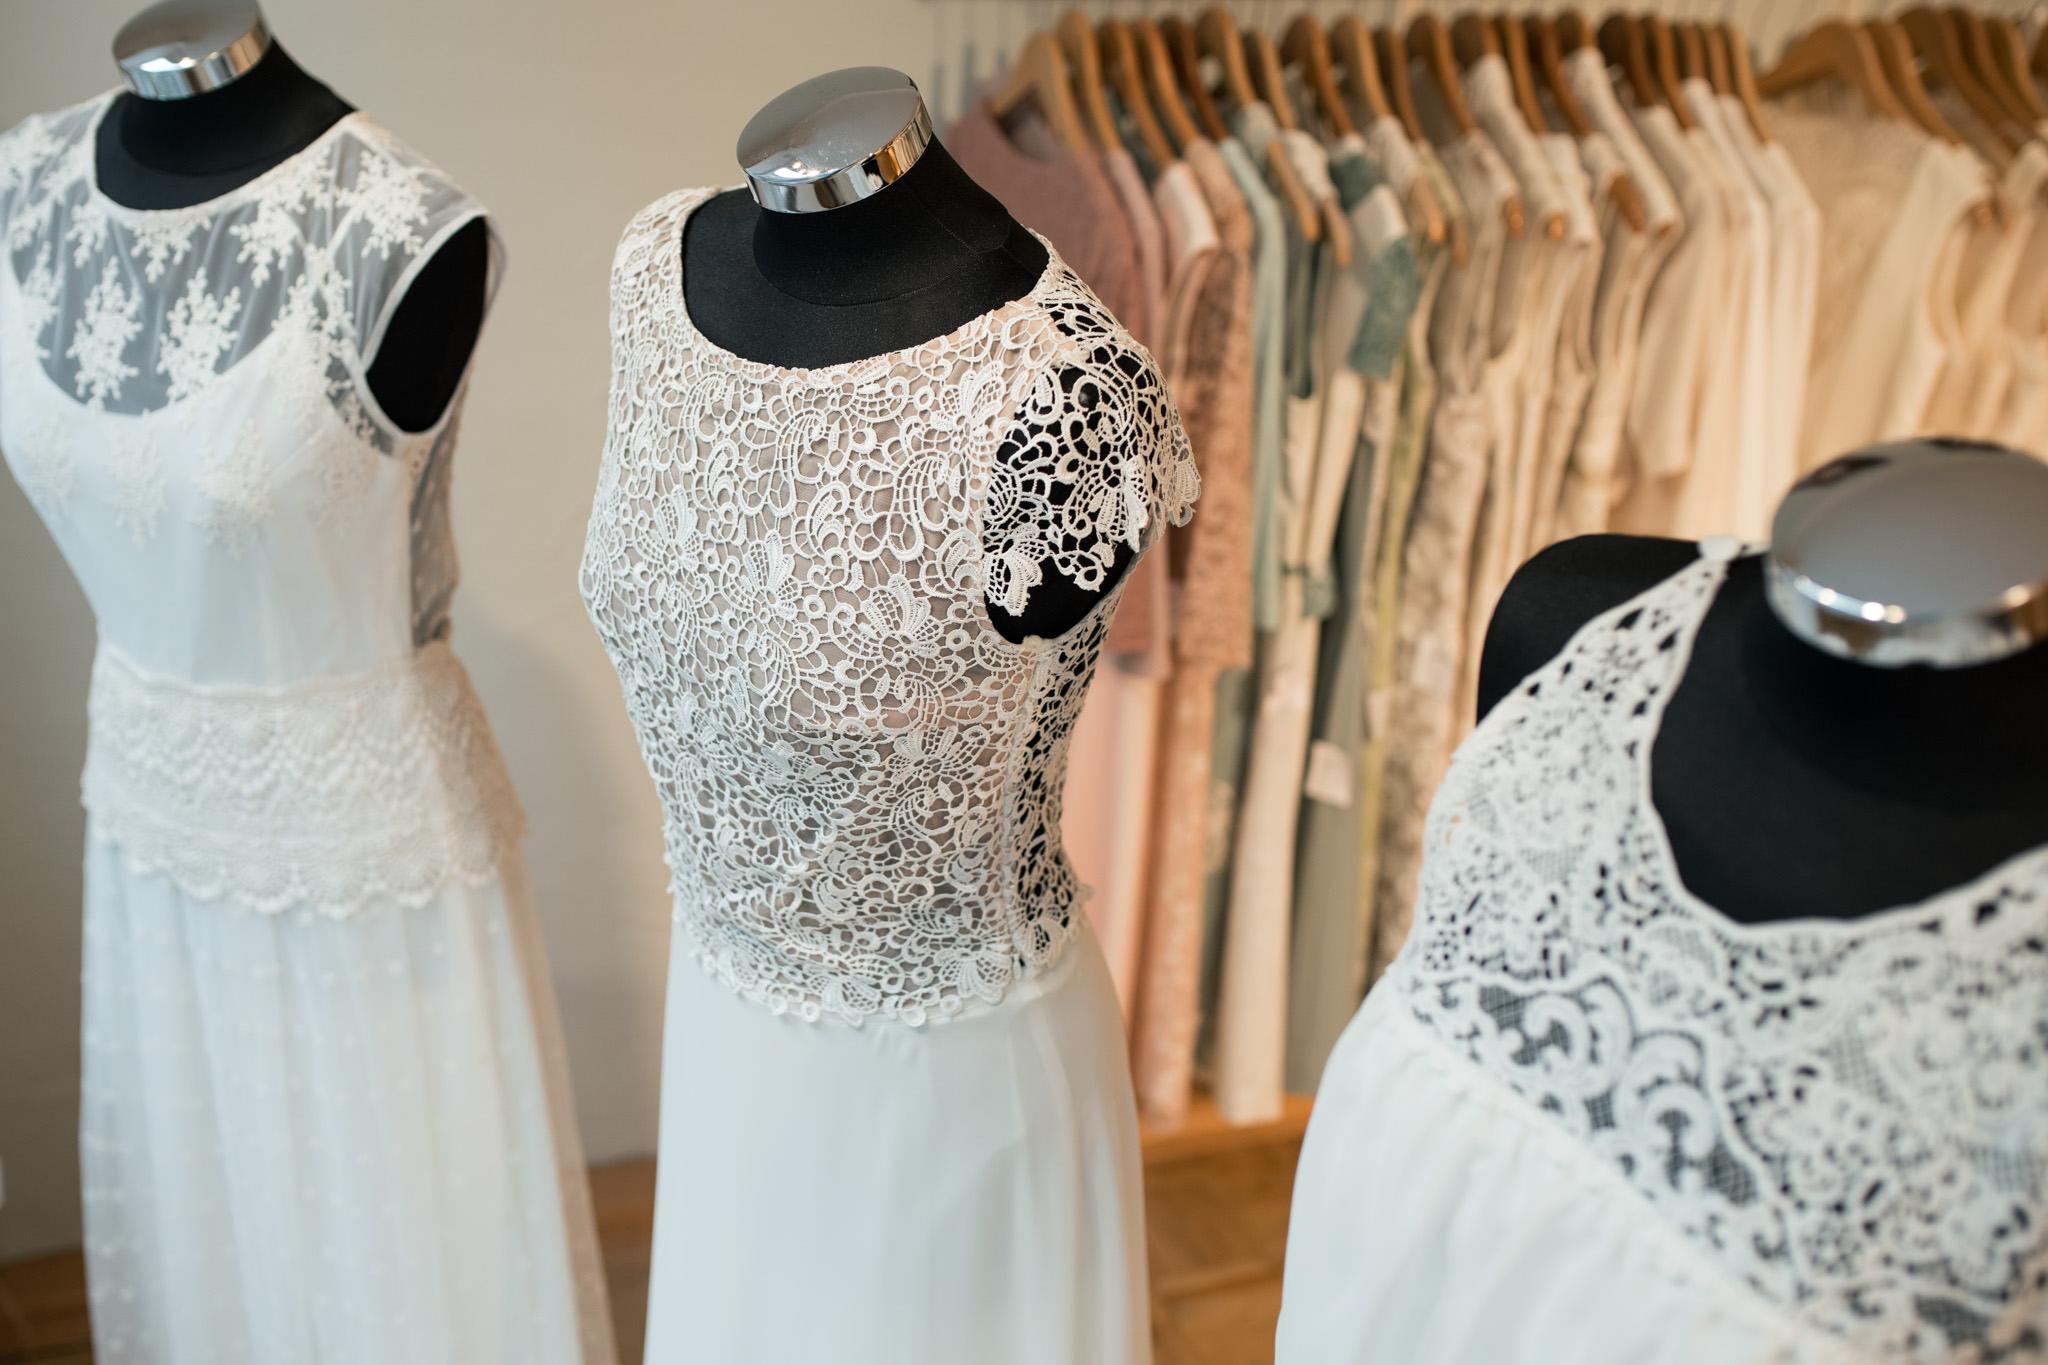 Claudia Heller Brautkleider handgefertigt